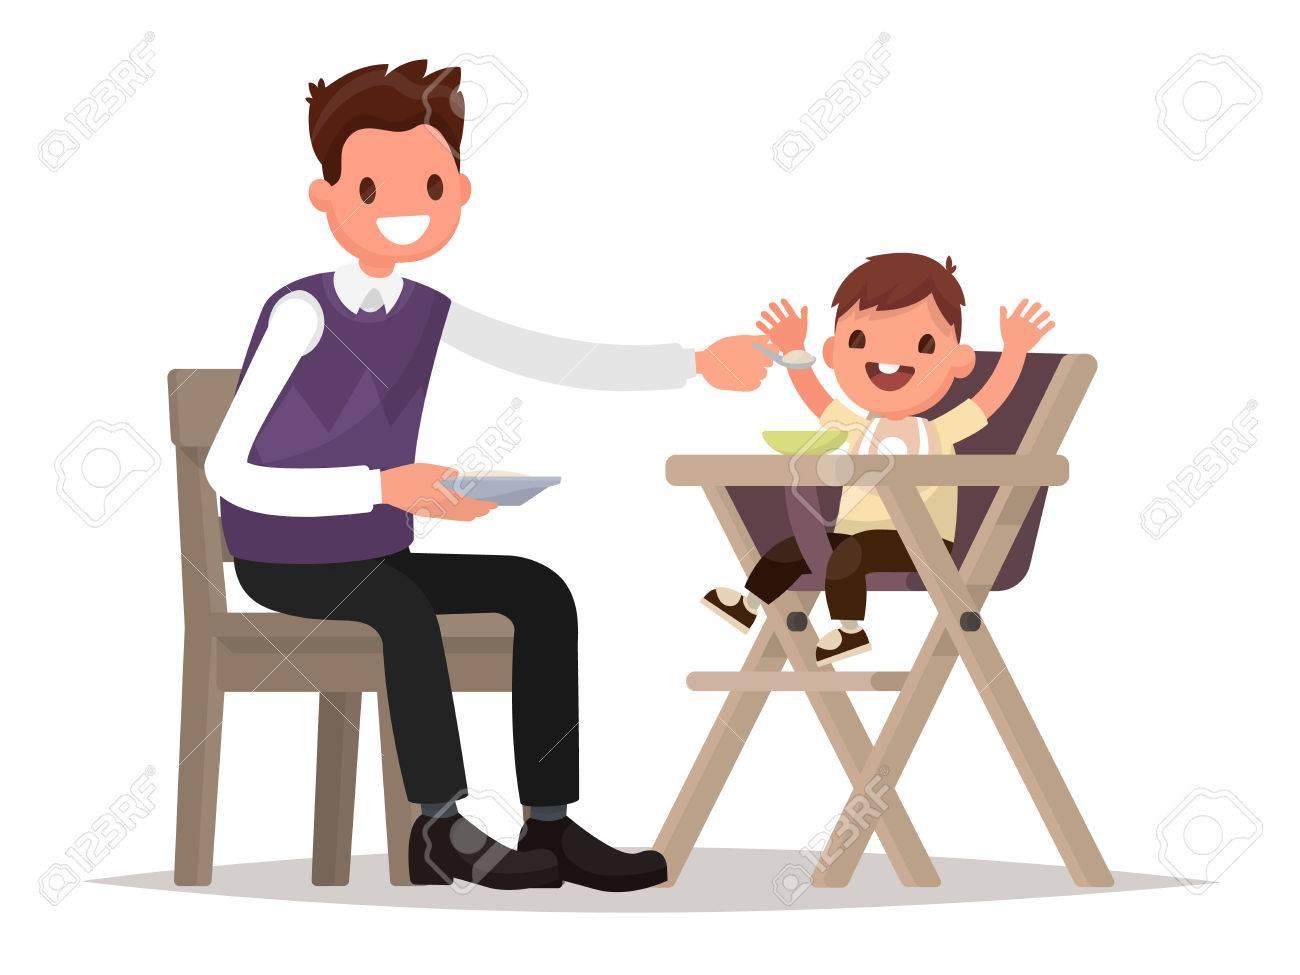 Kinderernahrung Vater Futtert Baby Im Hochstuhl Sitzen Vector